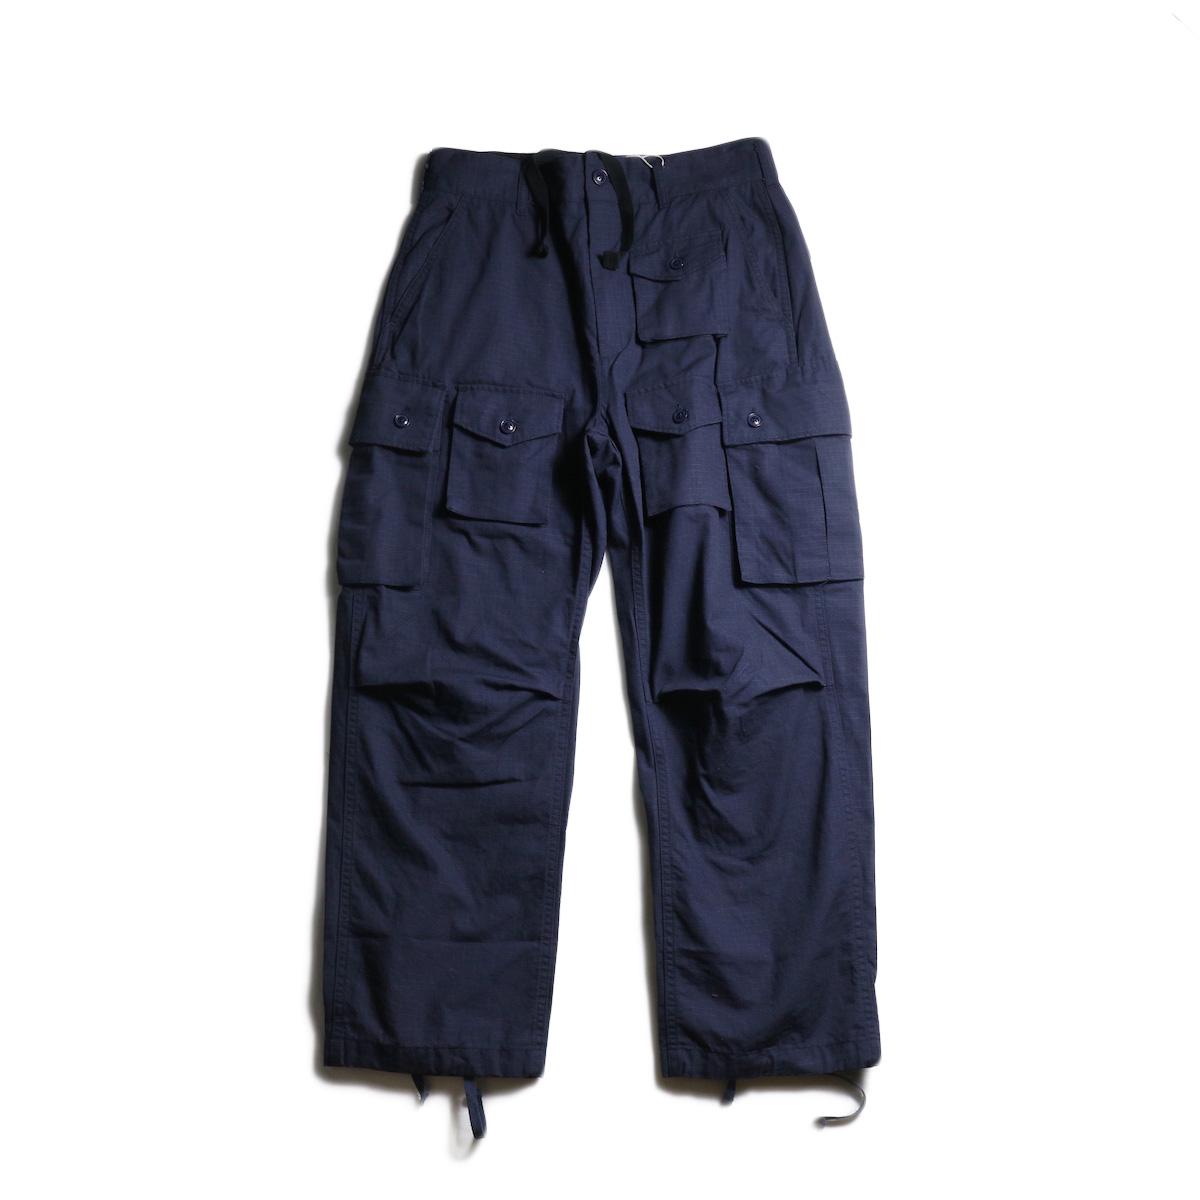 ENGINEERED GARMENTS /  FA Pant -Cotton Ripstop (Navy) 全体